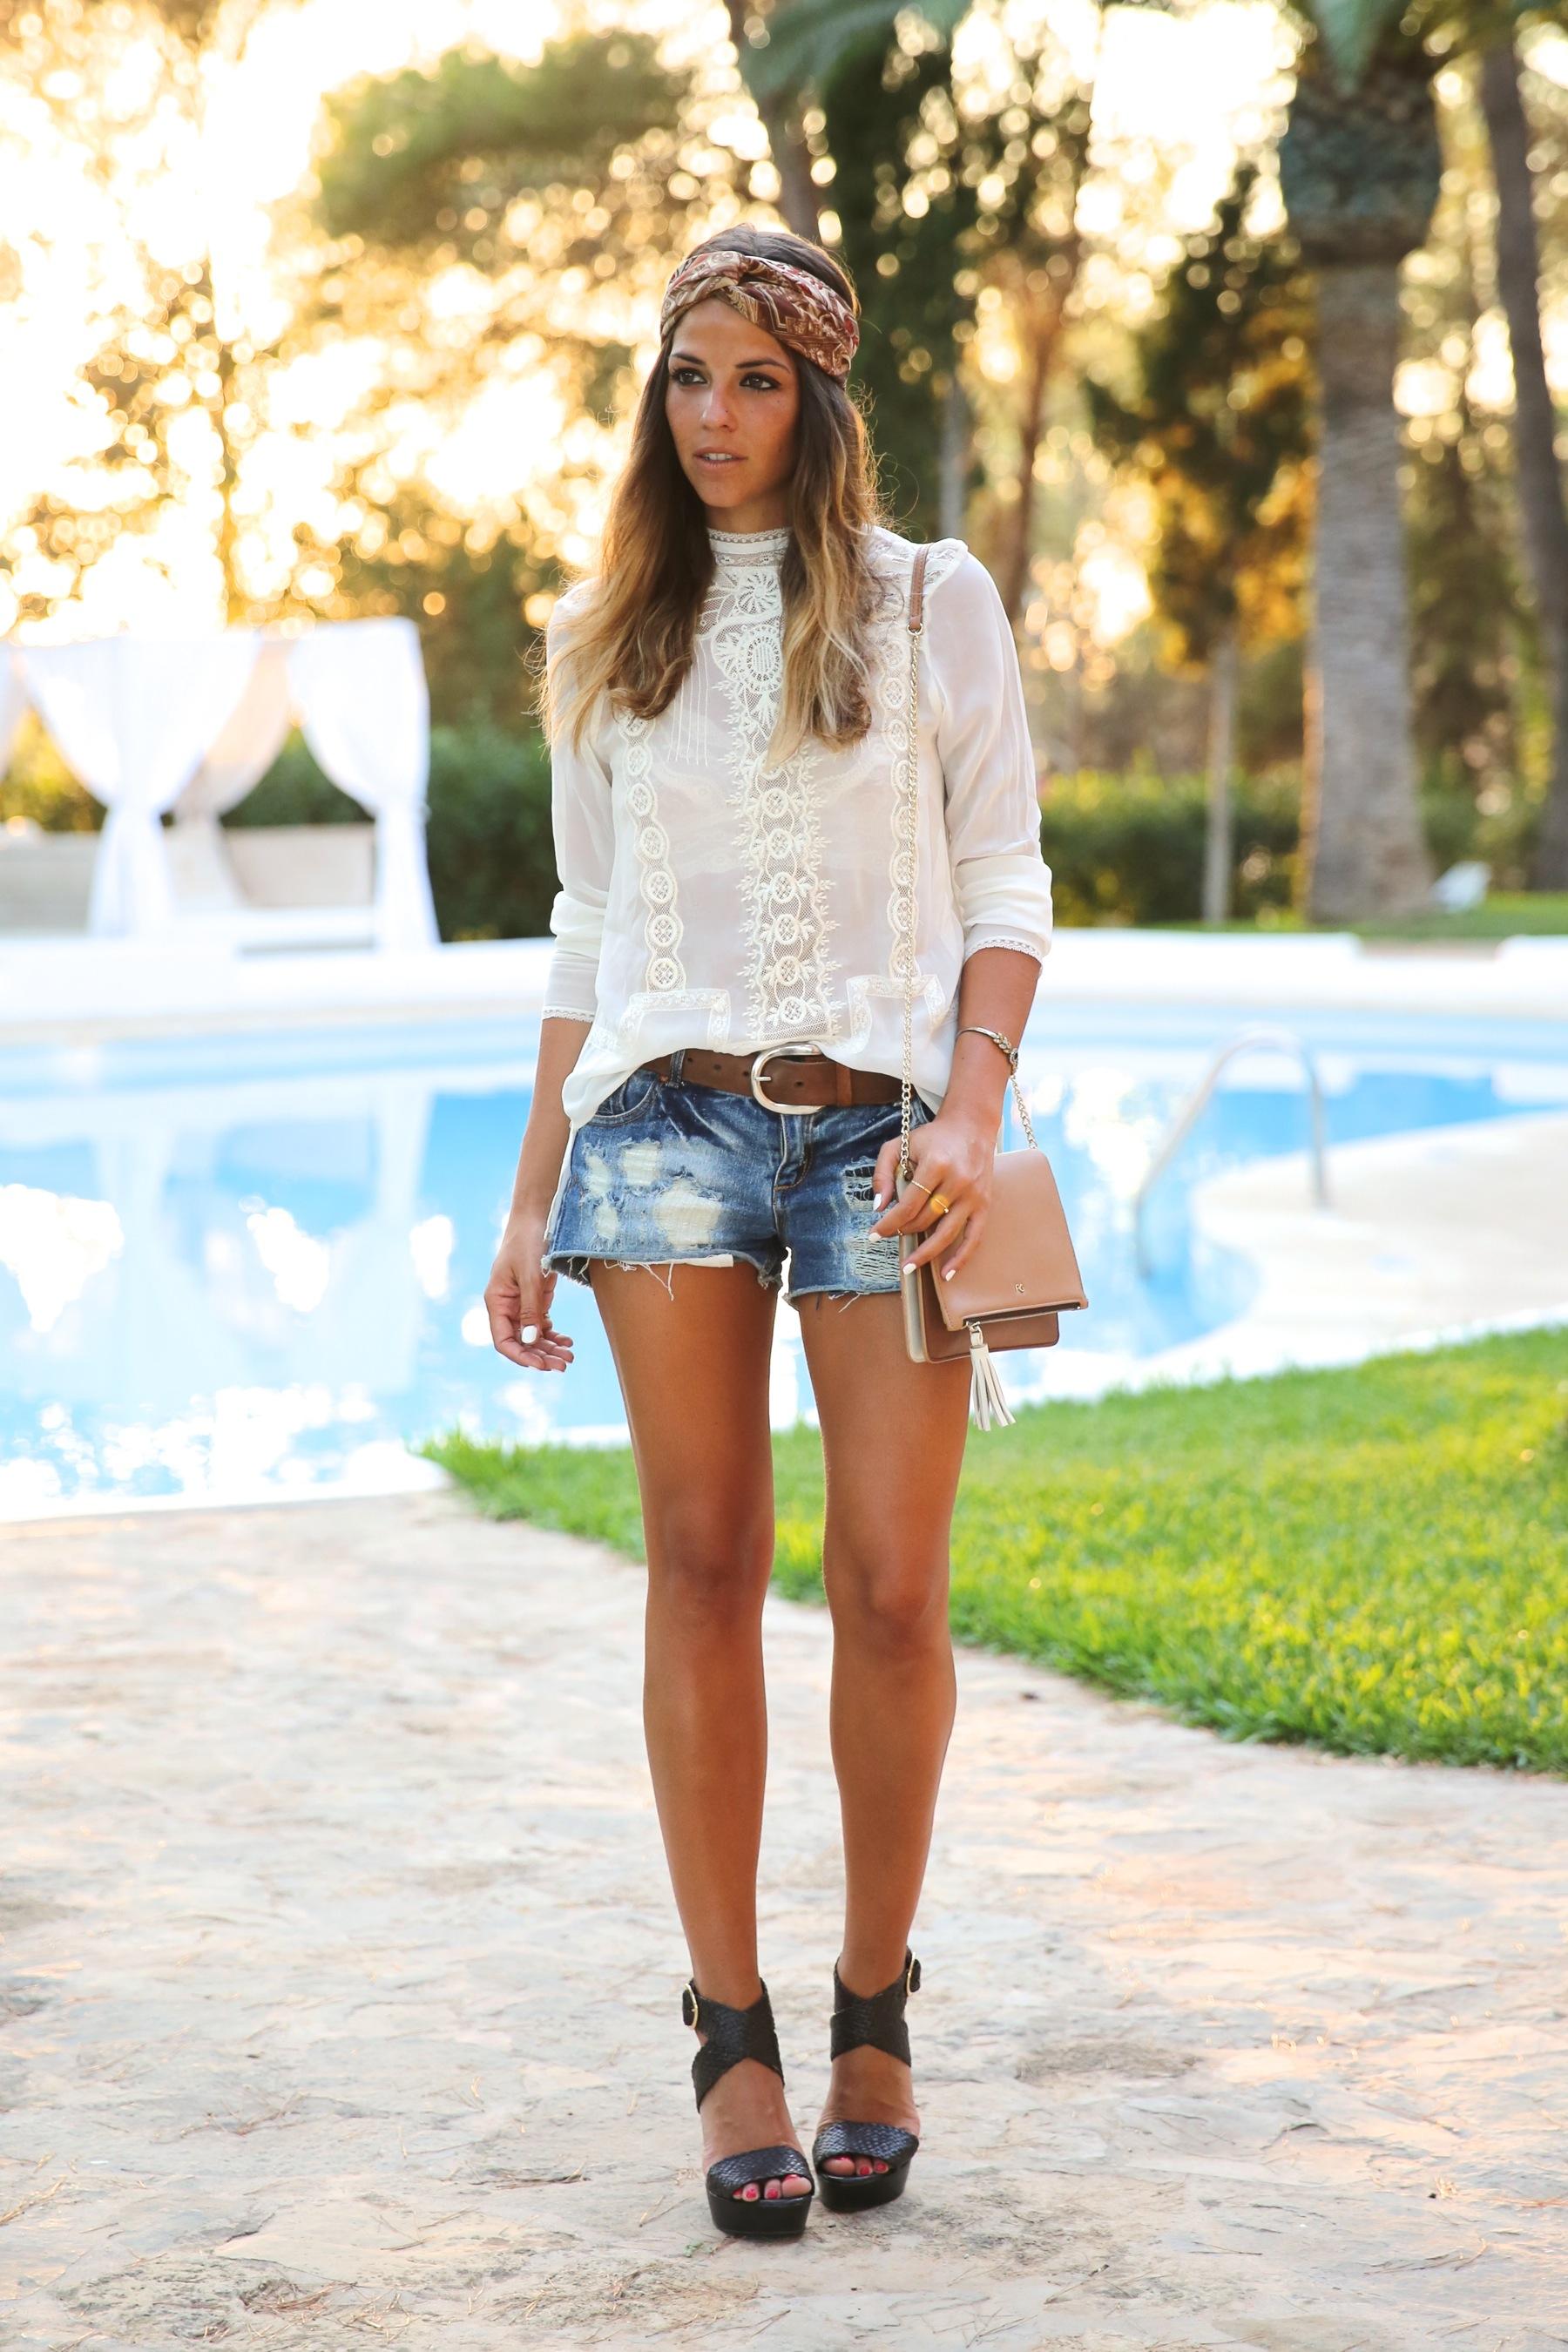 trendy_taste-look-outfit-street_style-ootd-blog-blogger-fashion_spain-moda_españa-boho-hippie-denim_shorts-shorts_vaqueros-blusa-blouse-mas34-pg-ibiza-sa_talaia-10